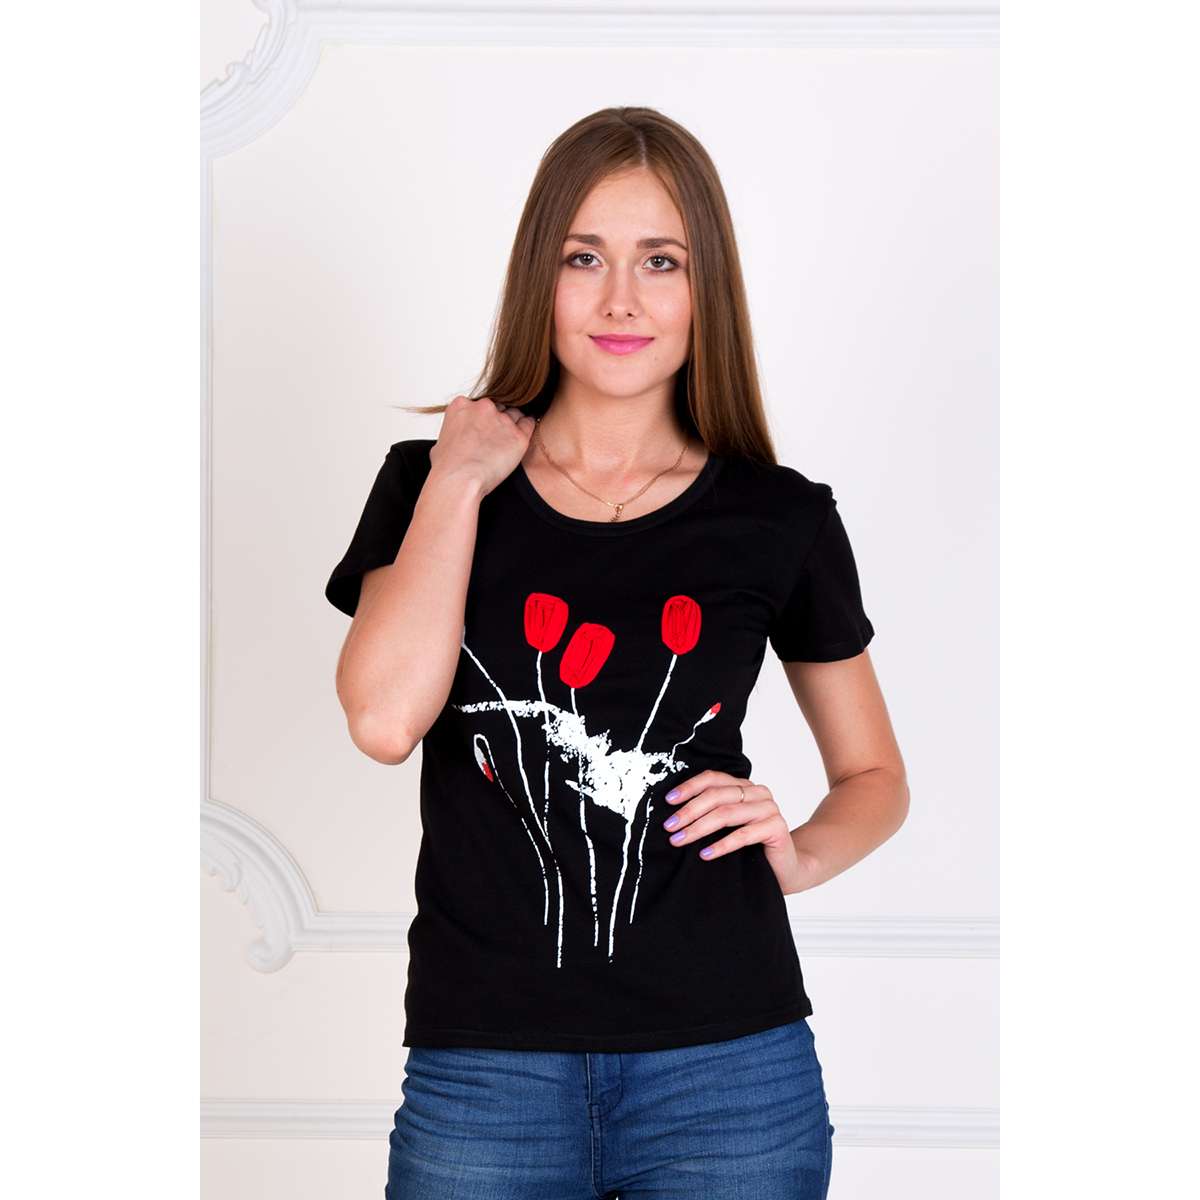 Женская футболка Маки, размер 44Майки и футболки<br>Обхват груди:88 см<br>Обхват талии:68 см<br>Обхват бедер:96 см<br>Рост:167 см<br><br>Тип: Жен. футболка<br>Размер: 44<br>Материал: Кулирка